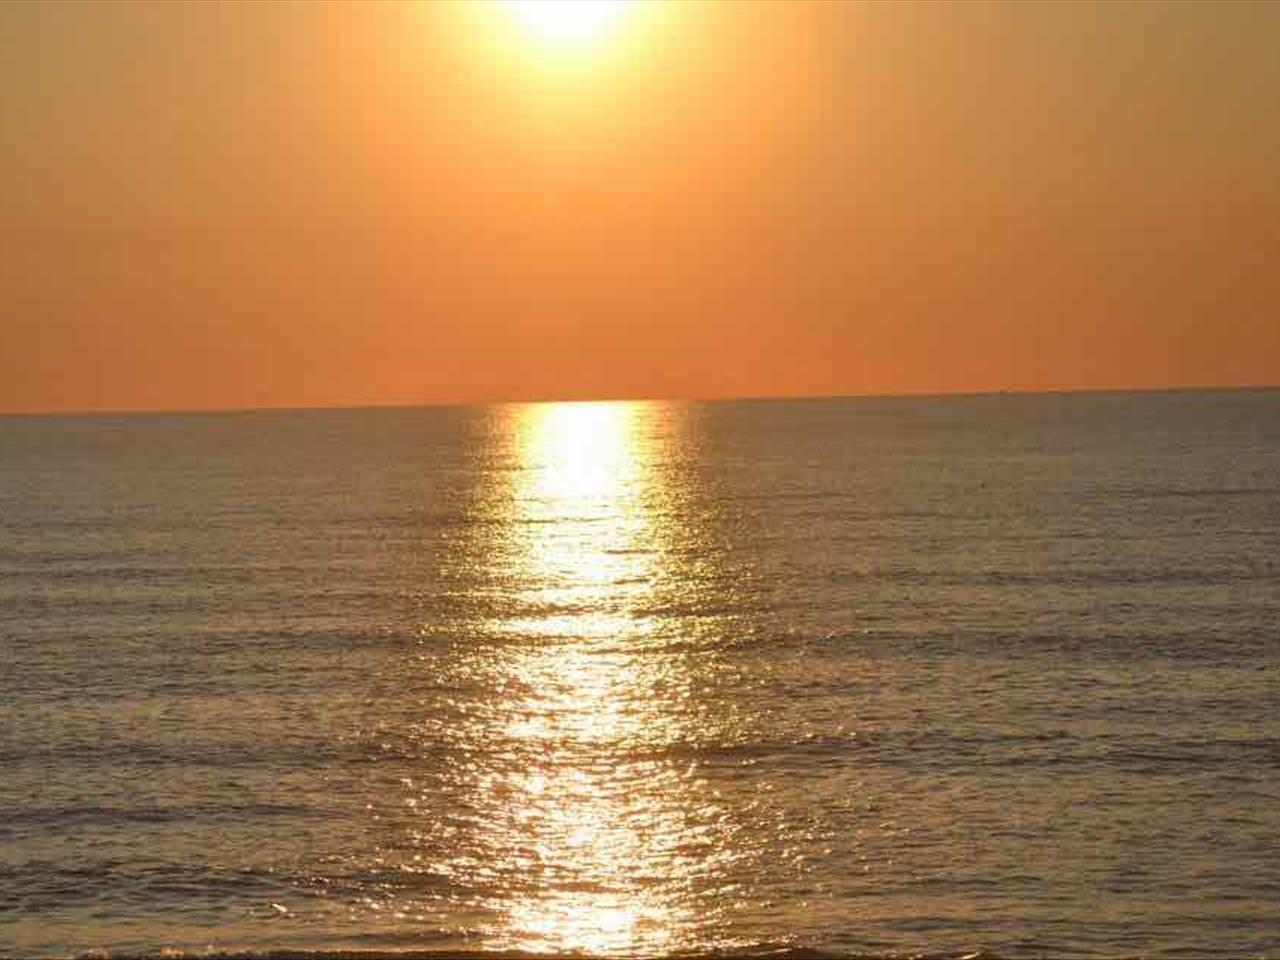 July 2015 Stay - SP5B - Sea Pointe Paradise, Luigi Tartara